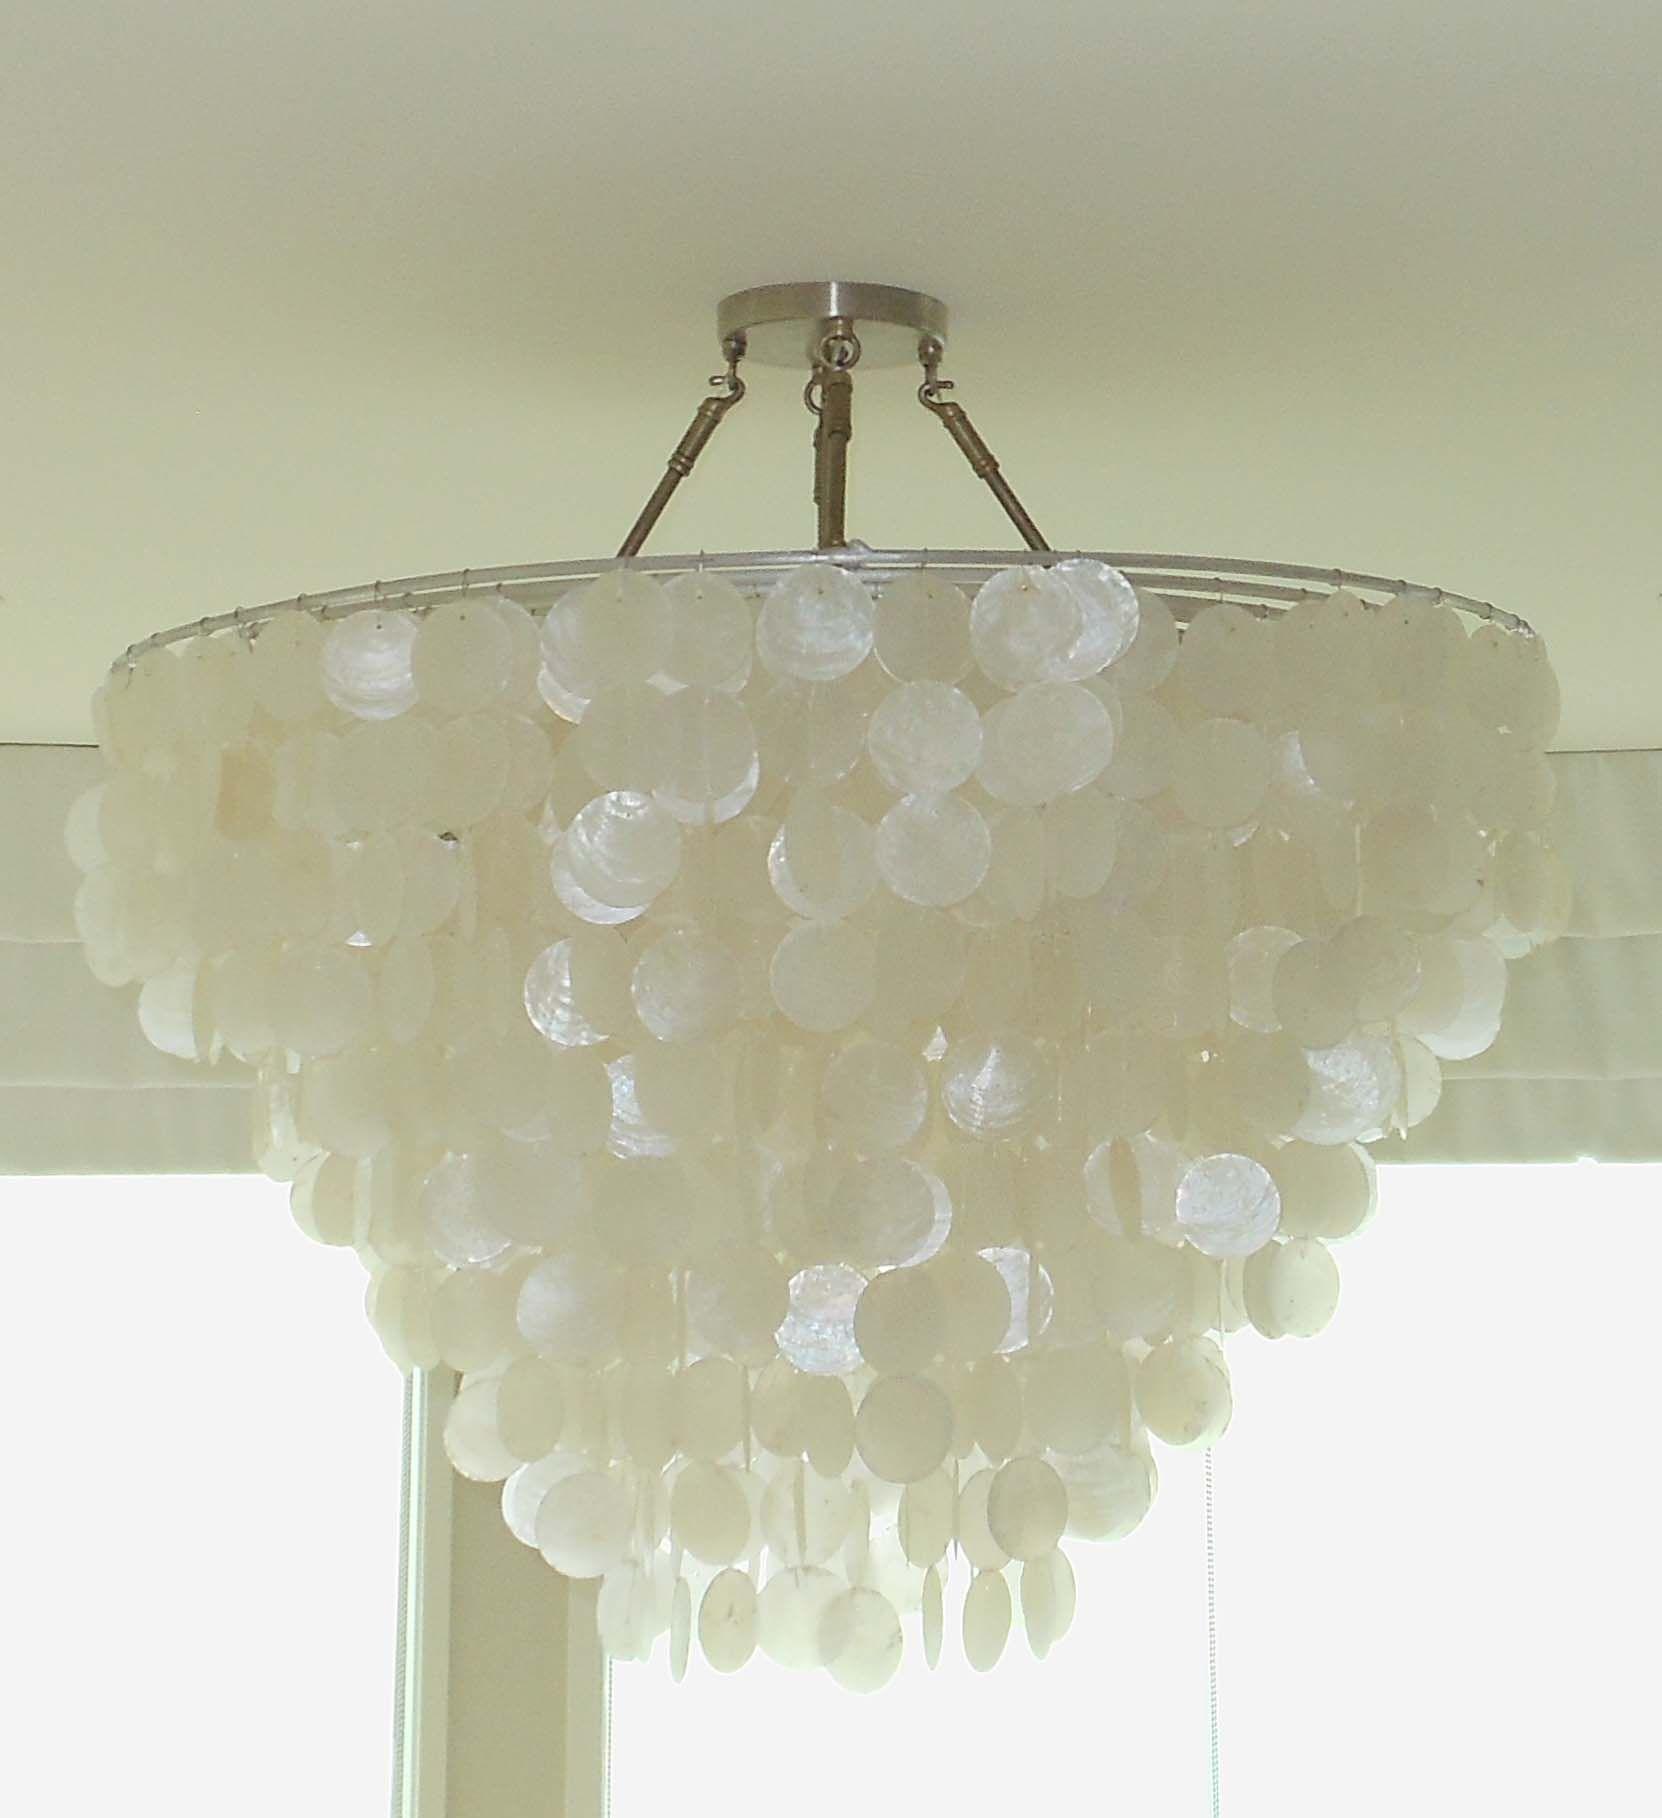 Custom capiz shell chandelier by sls designs inc stephens picks custom capiz shell chandelier by sls designs inc aloadofball Gallery